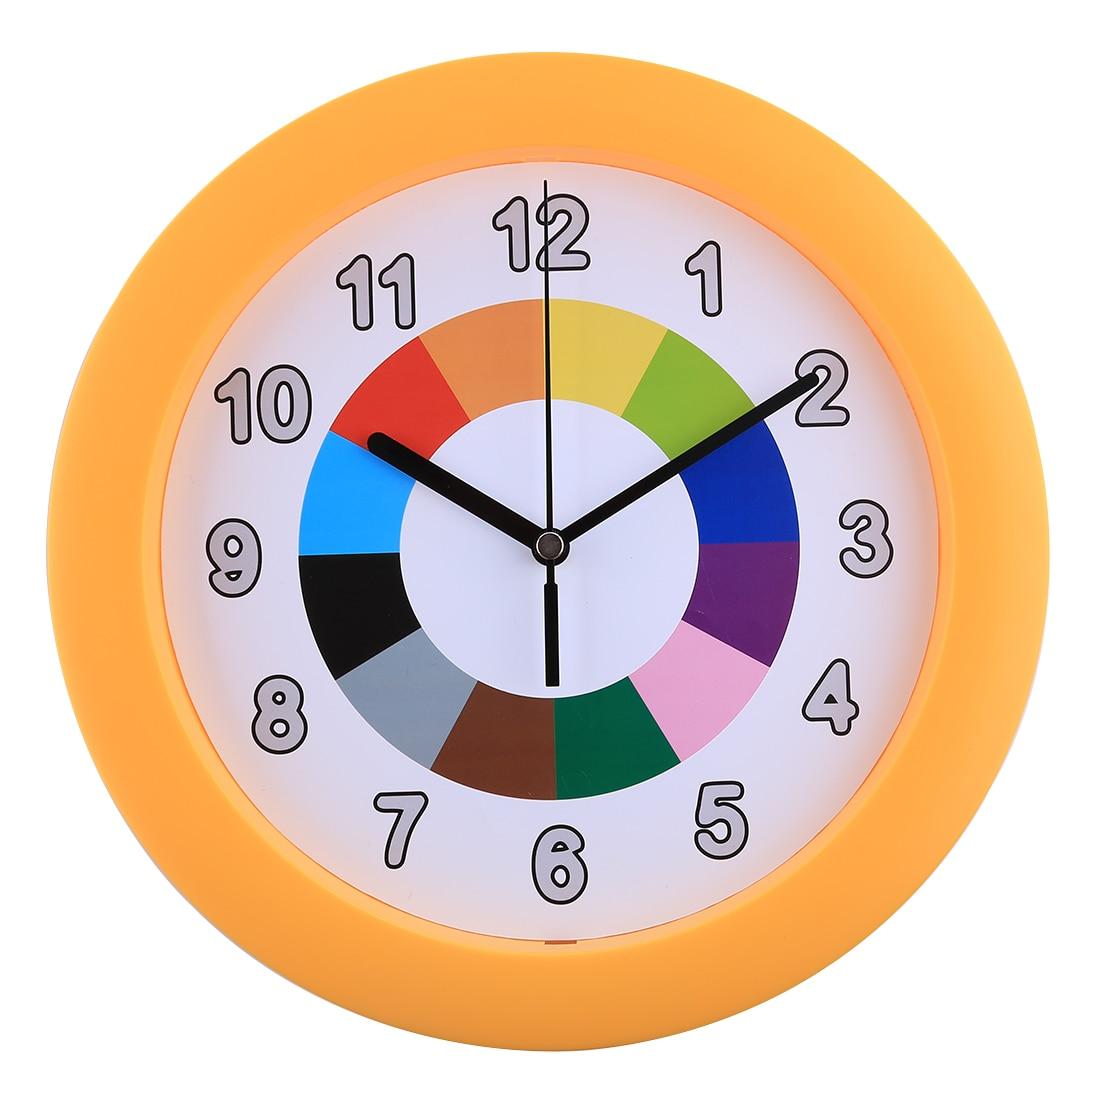 10 Inch Children Creative Silent Wall Clock Kids Mute Quarz Clocks For Bedroom Wall Decor Modern Design Decorative